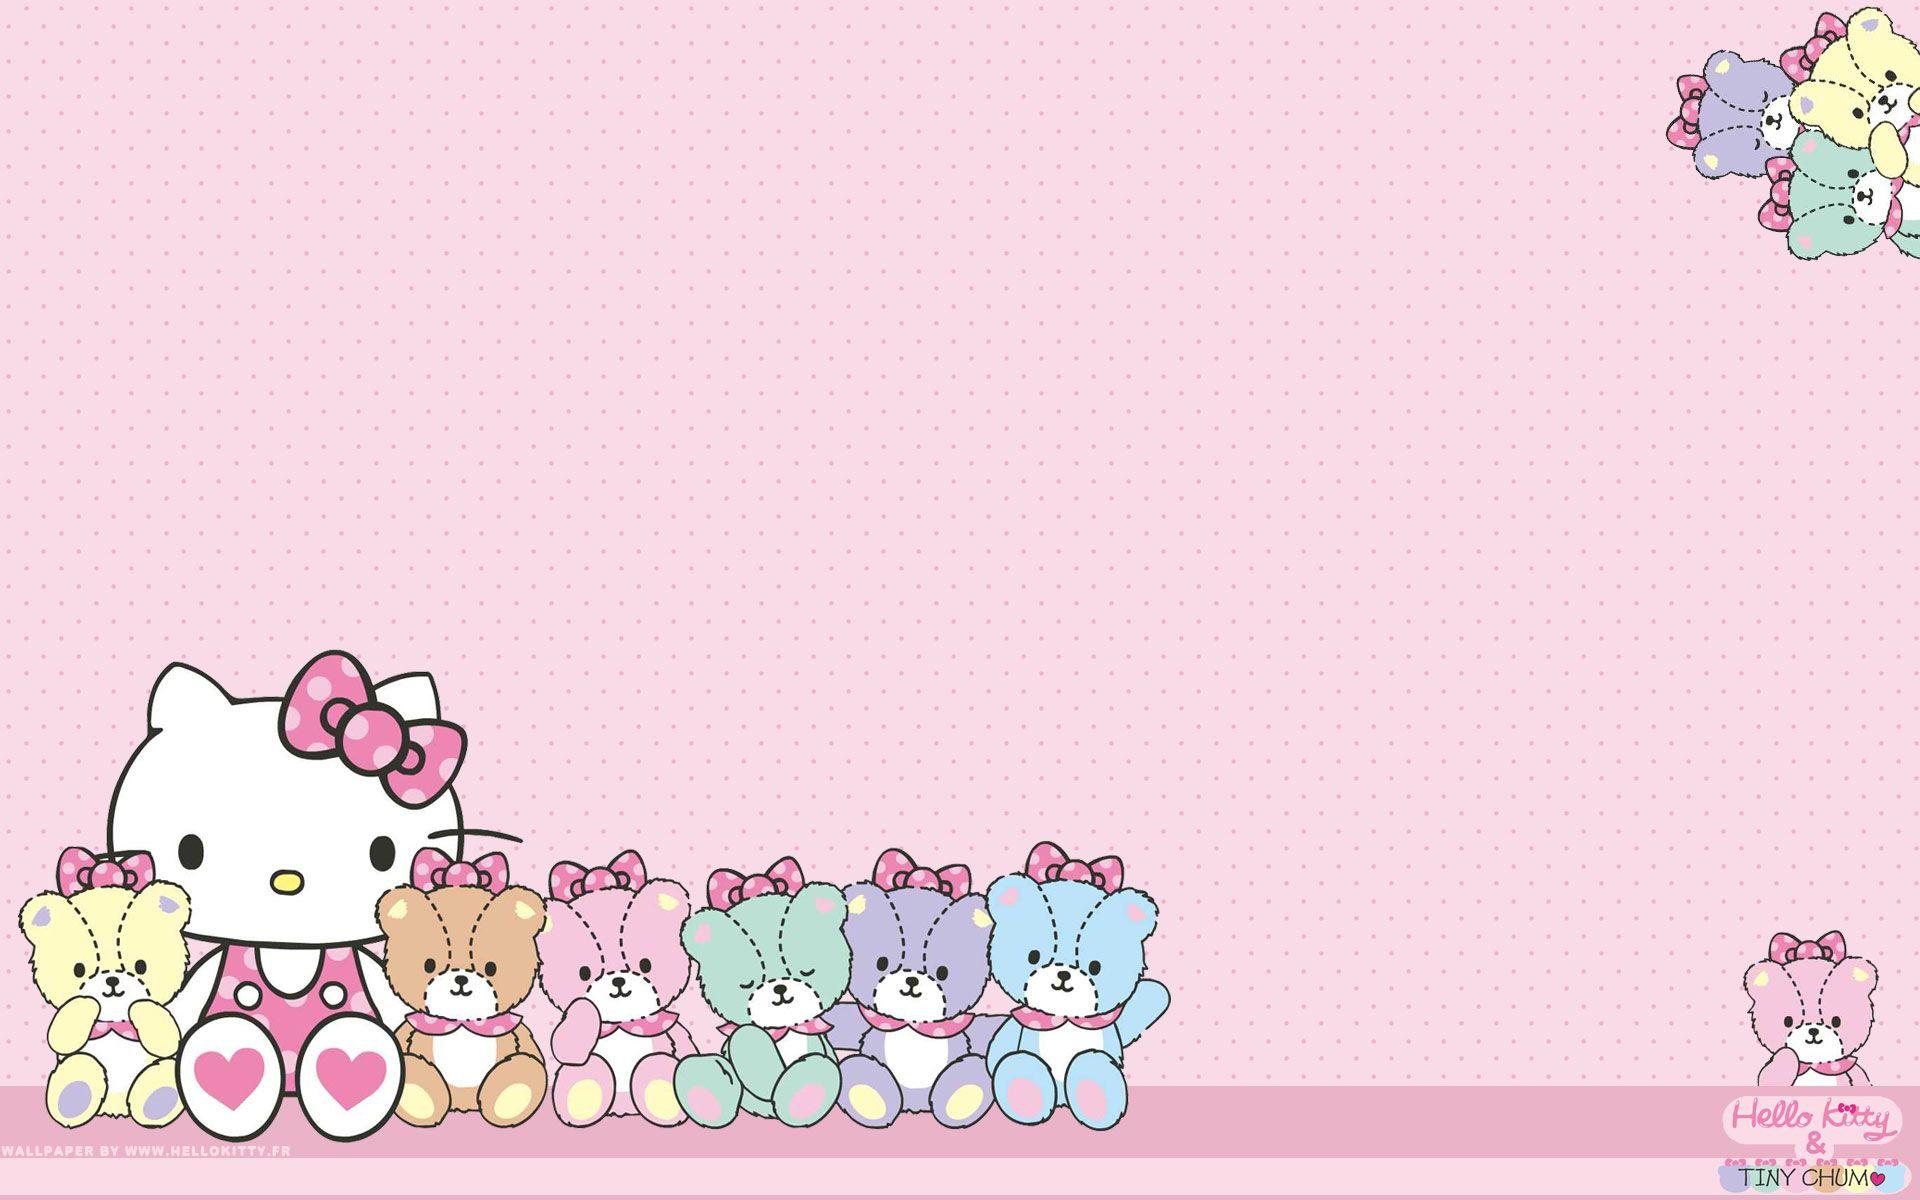 Most Inspiring Wallpaper Hello Kitty Android - ccd0e32392350676fdd1c76da507d7ed  Best Photo Reference_939734.jpg